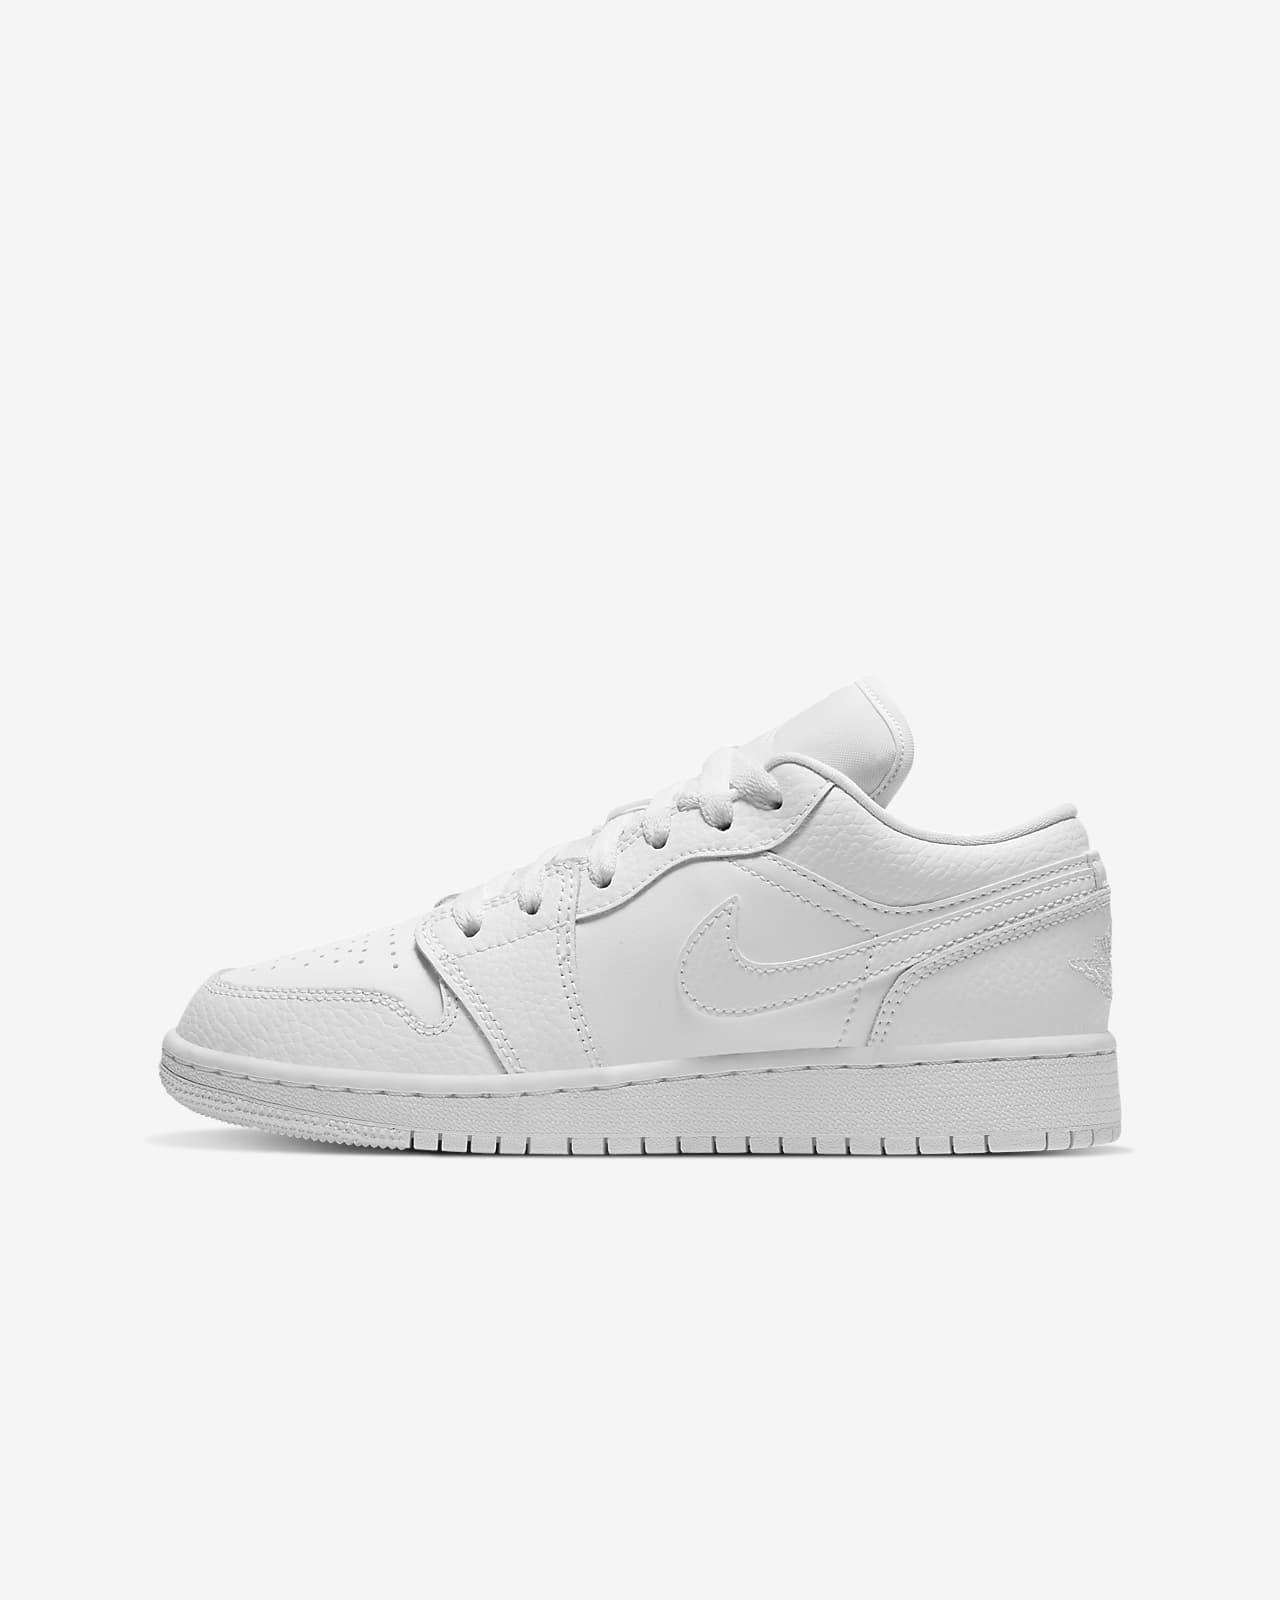 Air Jordan 1 Low Older Kids' Shoe. Nike BE